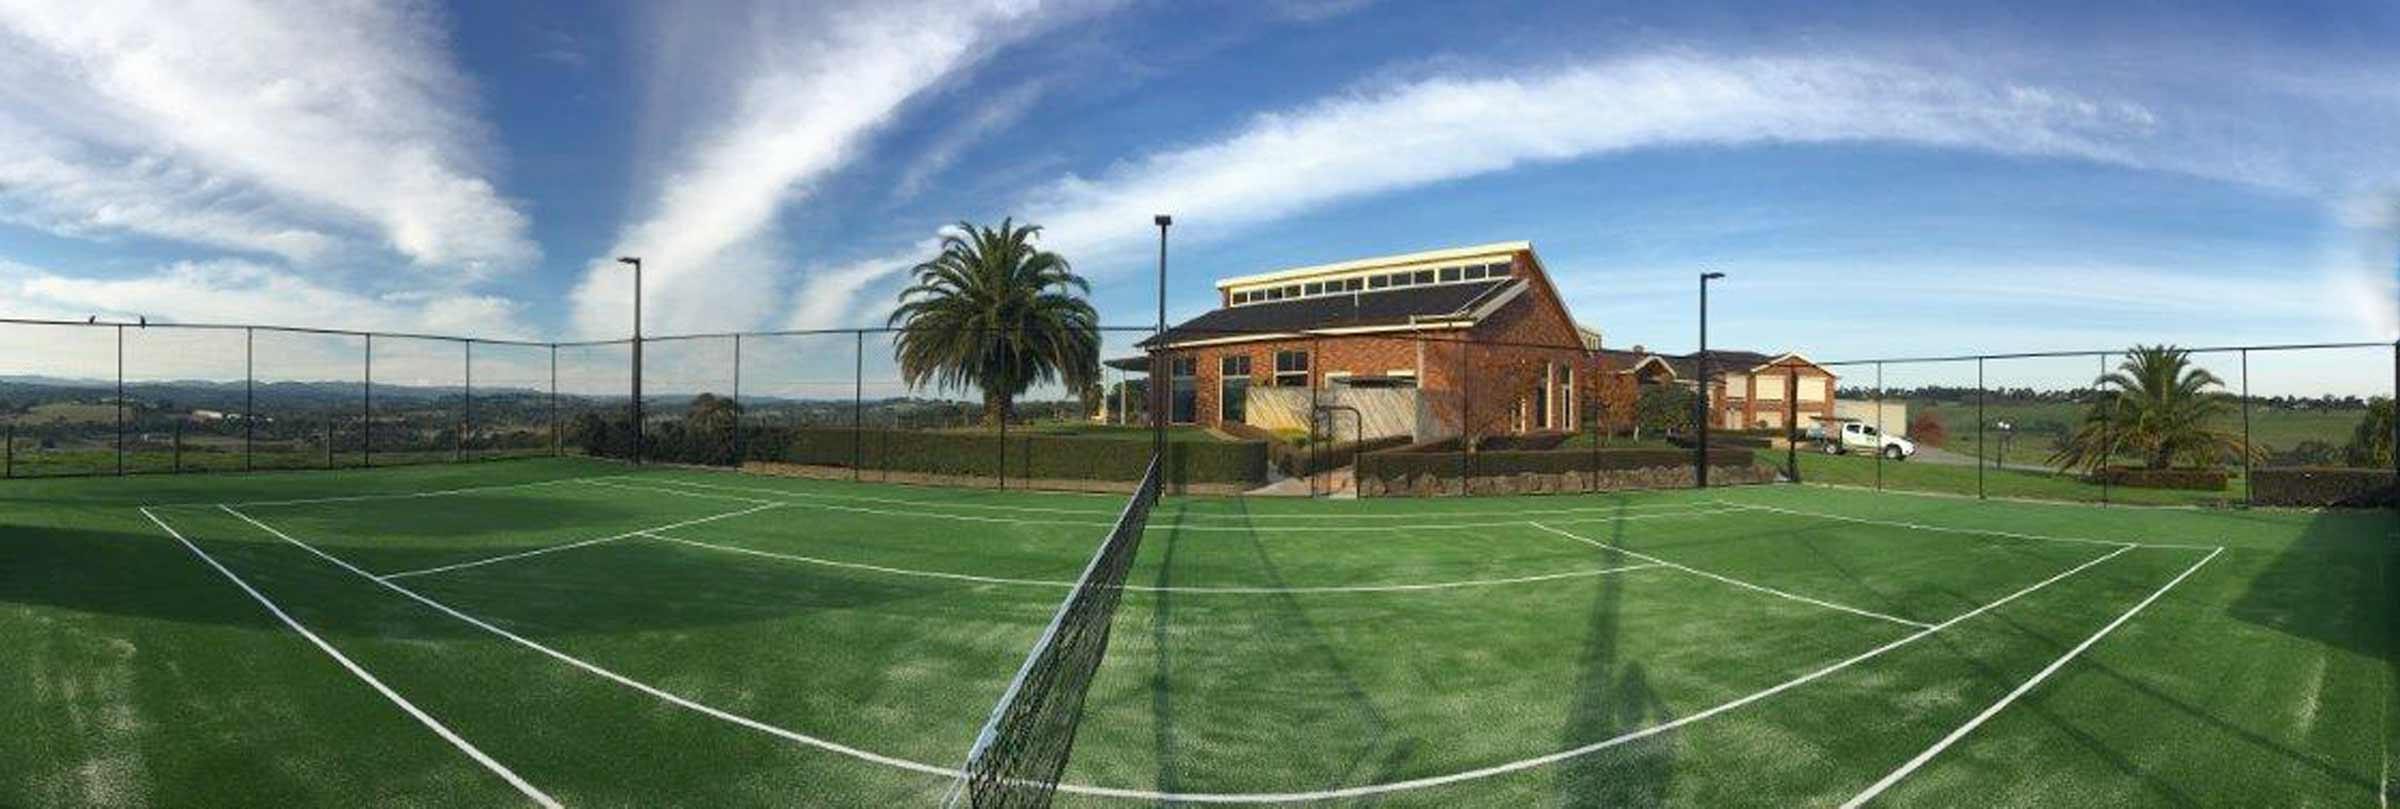 Tennis Court Maintenance Service in Melbourne